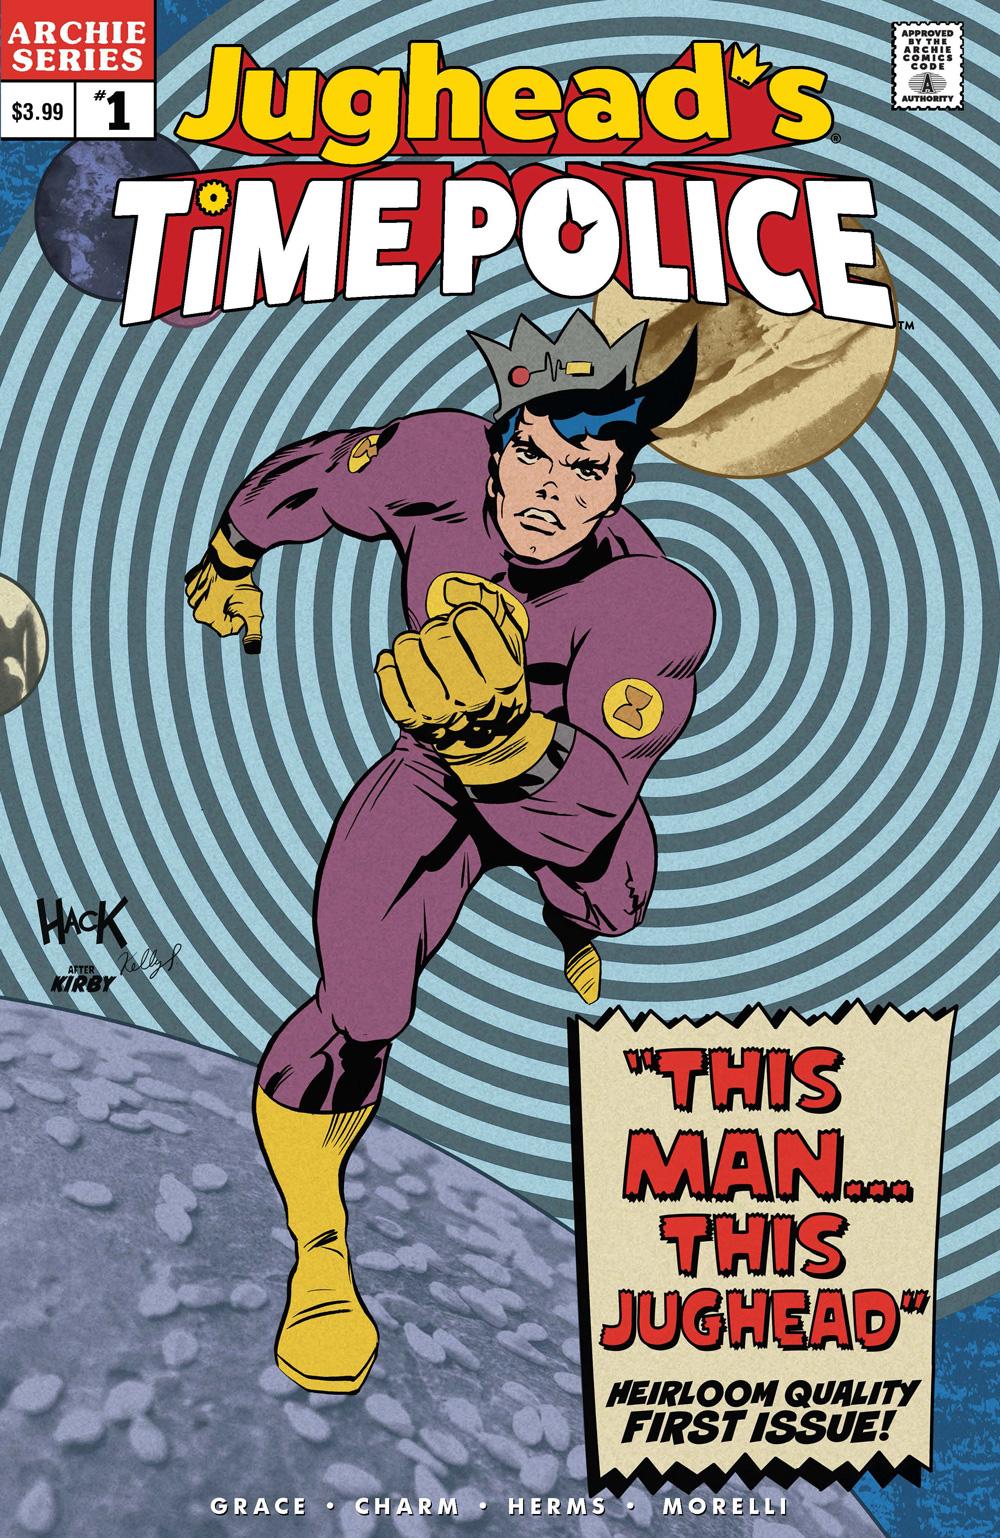 Jughead's Time Police #1